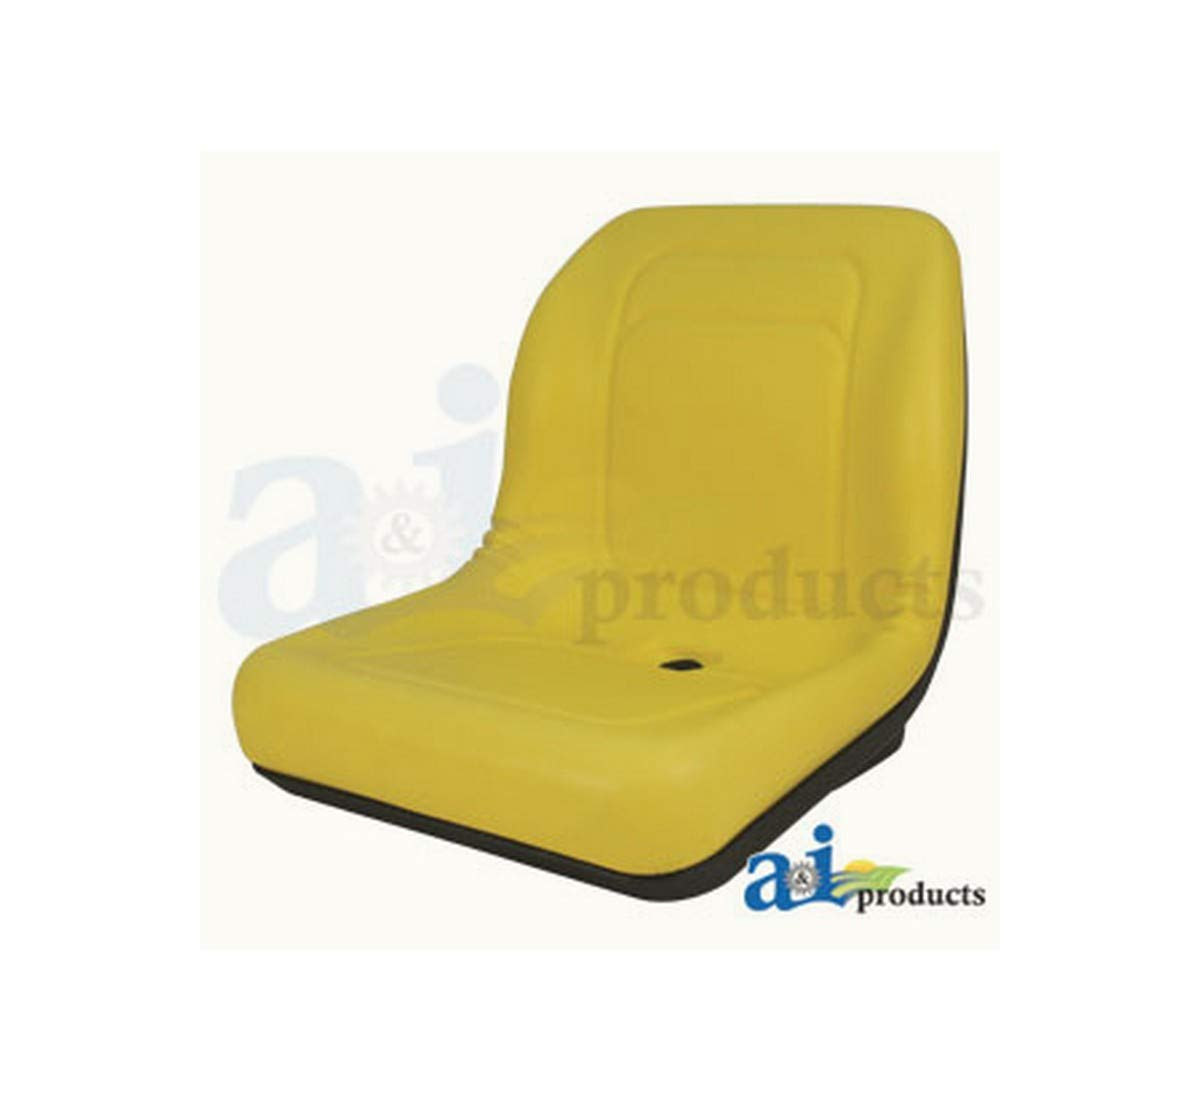 Set-of-2-High-Back-Seats-for-John-Deere-Trail-Worksite-amp-Turf-Gator-4X2 6X4 LGT100YL